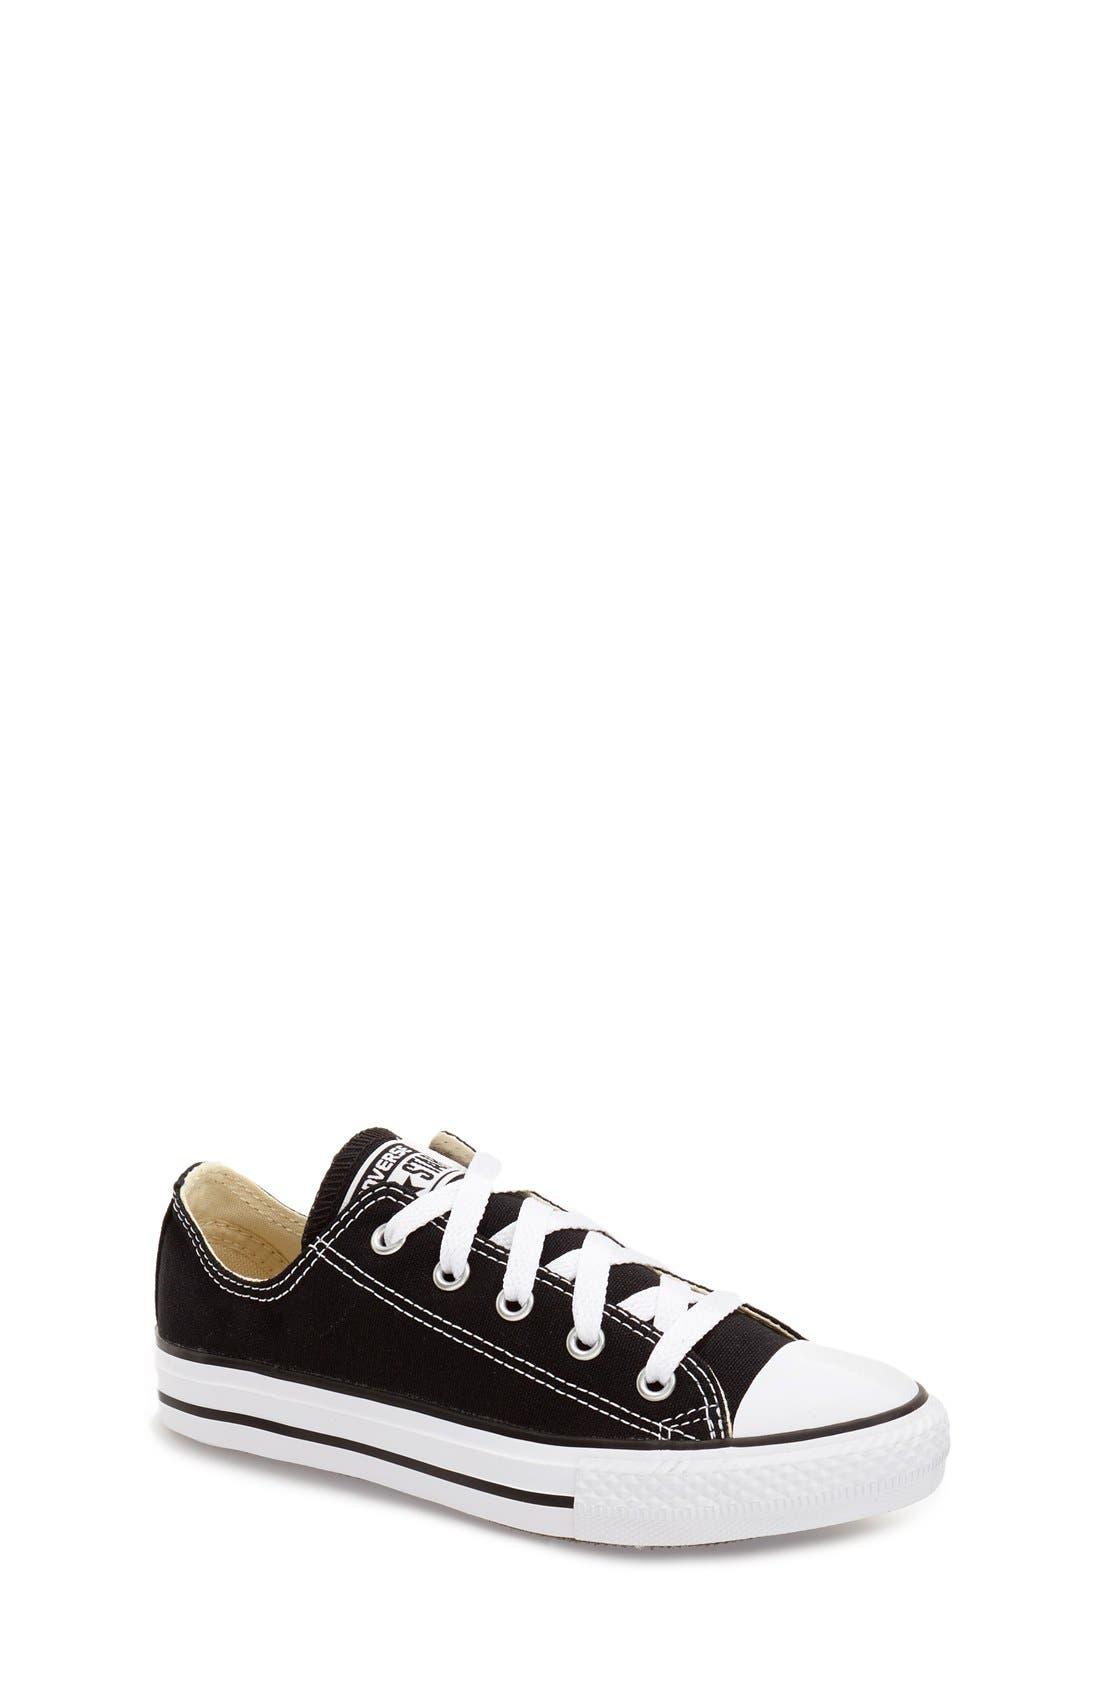 Alternate Image 1 Selected - Converse Chuck Taylor® Sneaker (Toddler, Little Kid & Big Kid)